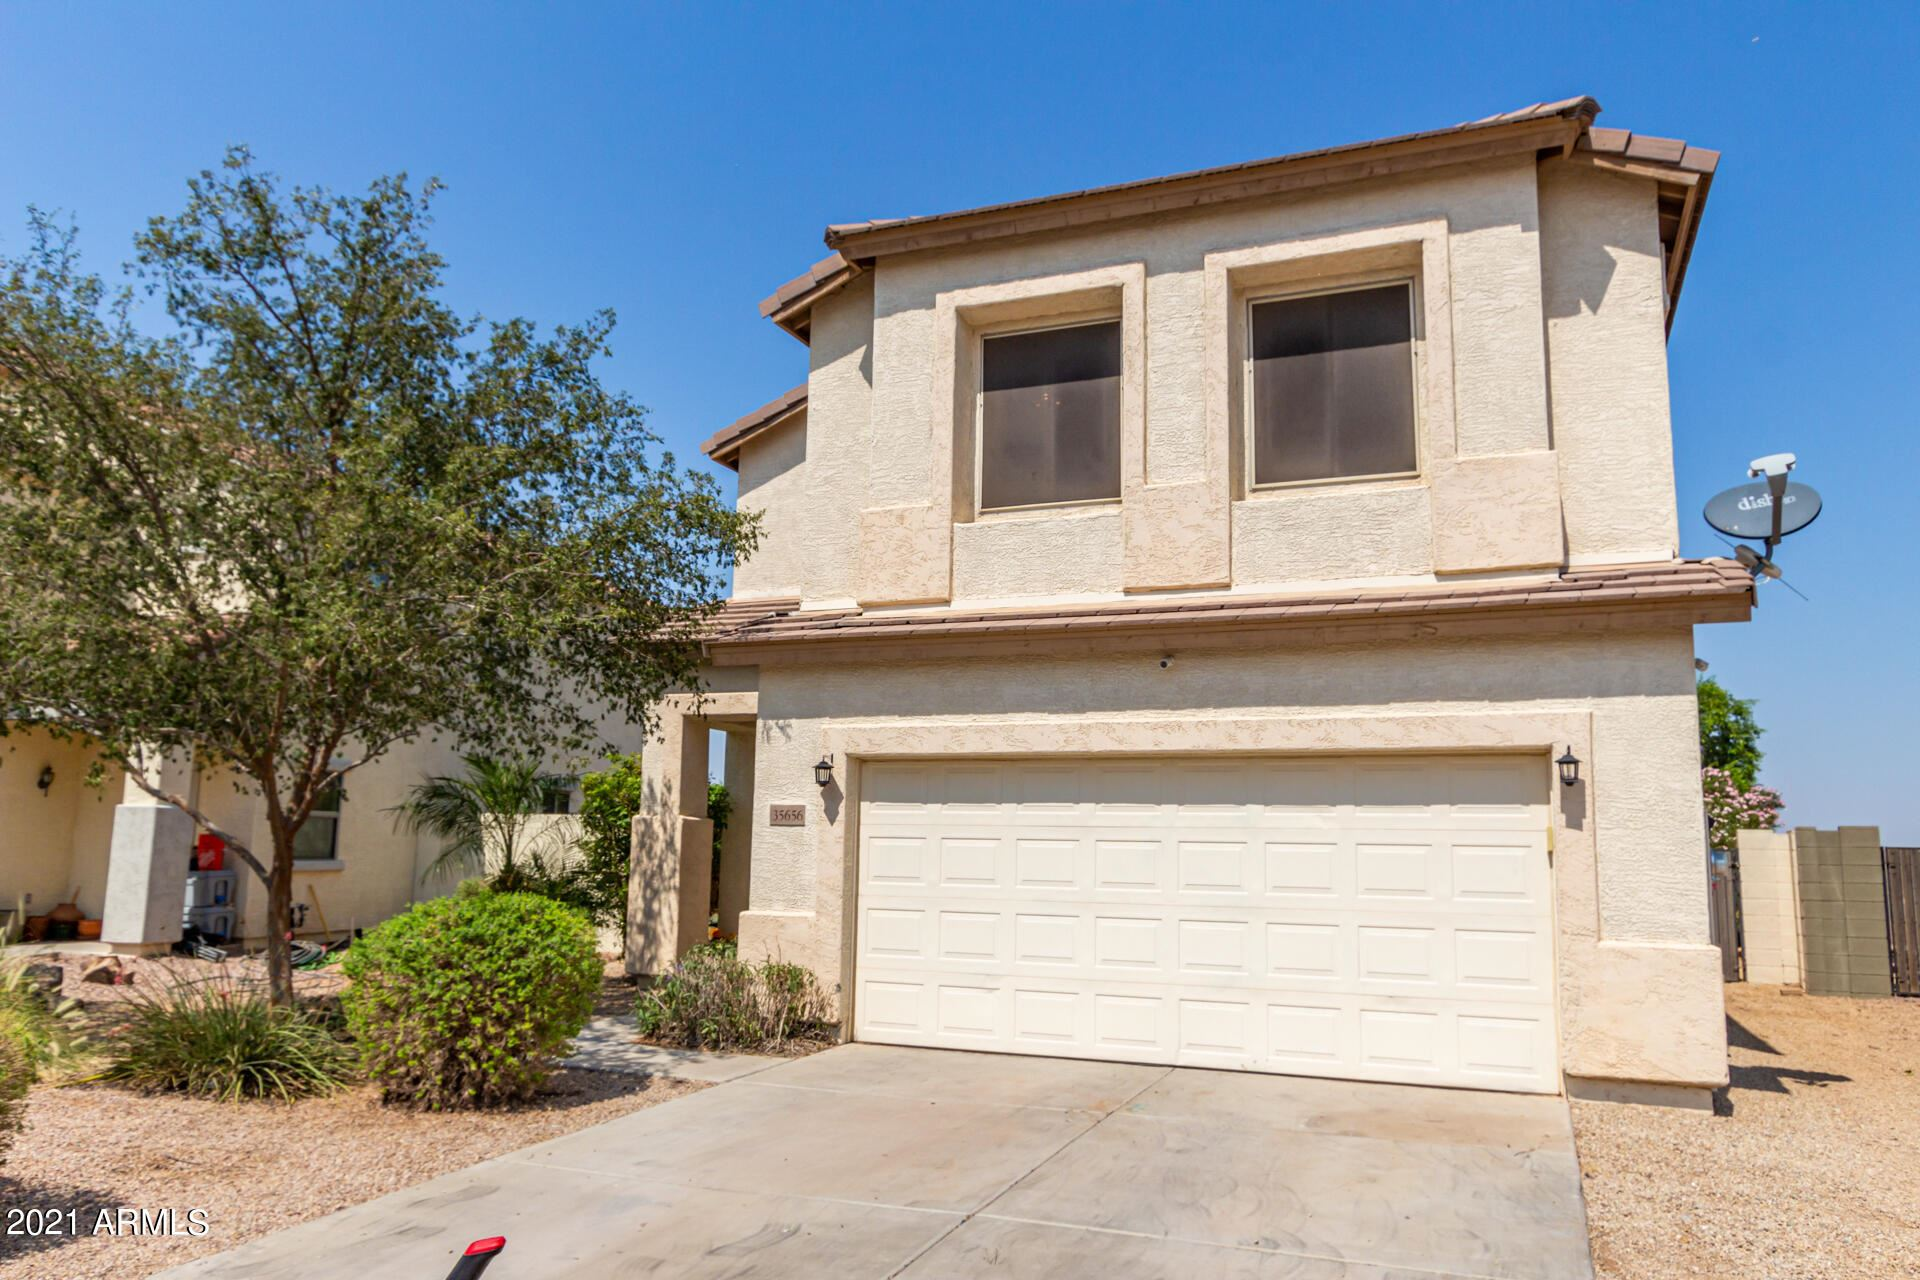 Photo of 35656 W COSTA BLANCA Drive, Maricopa, AZ 85138 (MLS # 6293413)